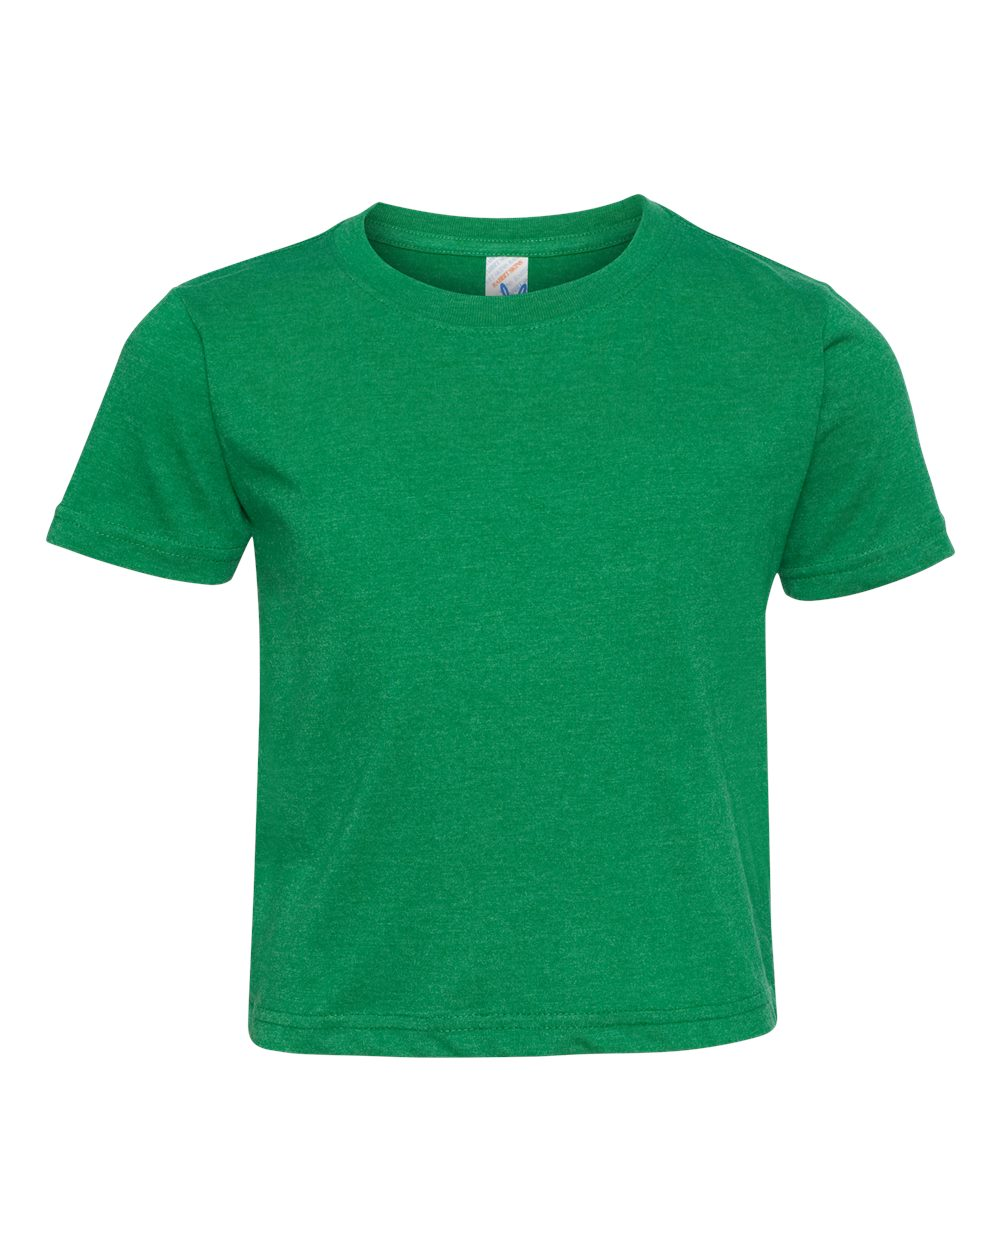 5e62ae040 Rabbit Skins Toddler Vintage T-Shirt - 3305 $3.37 - Infant & Toddler